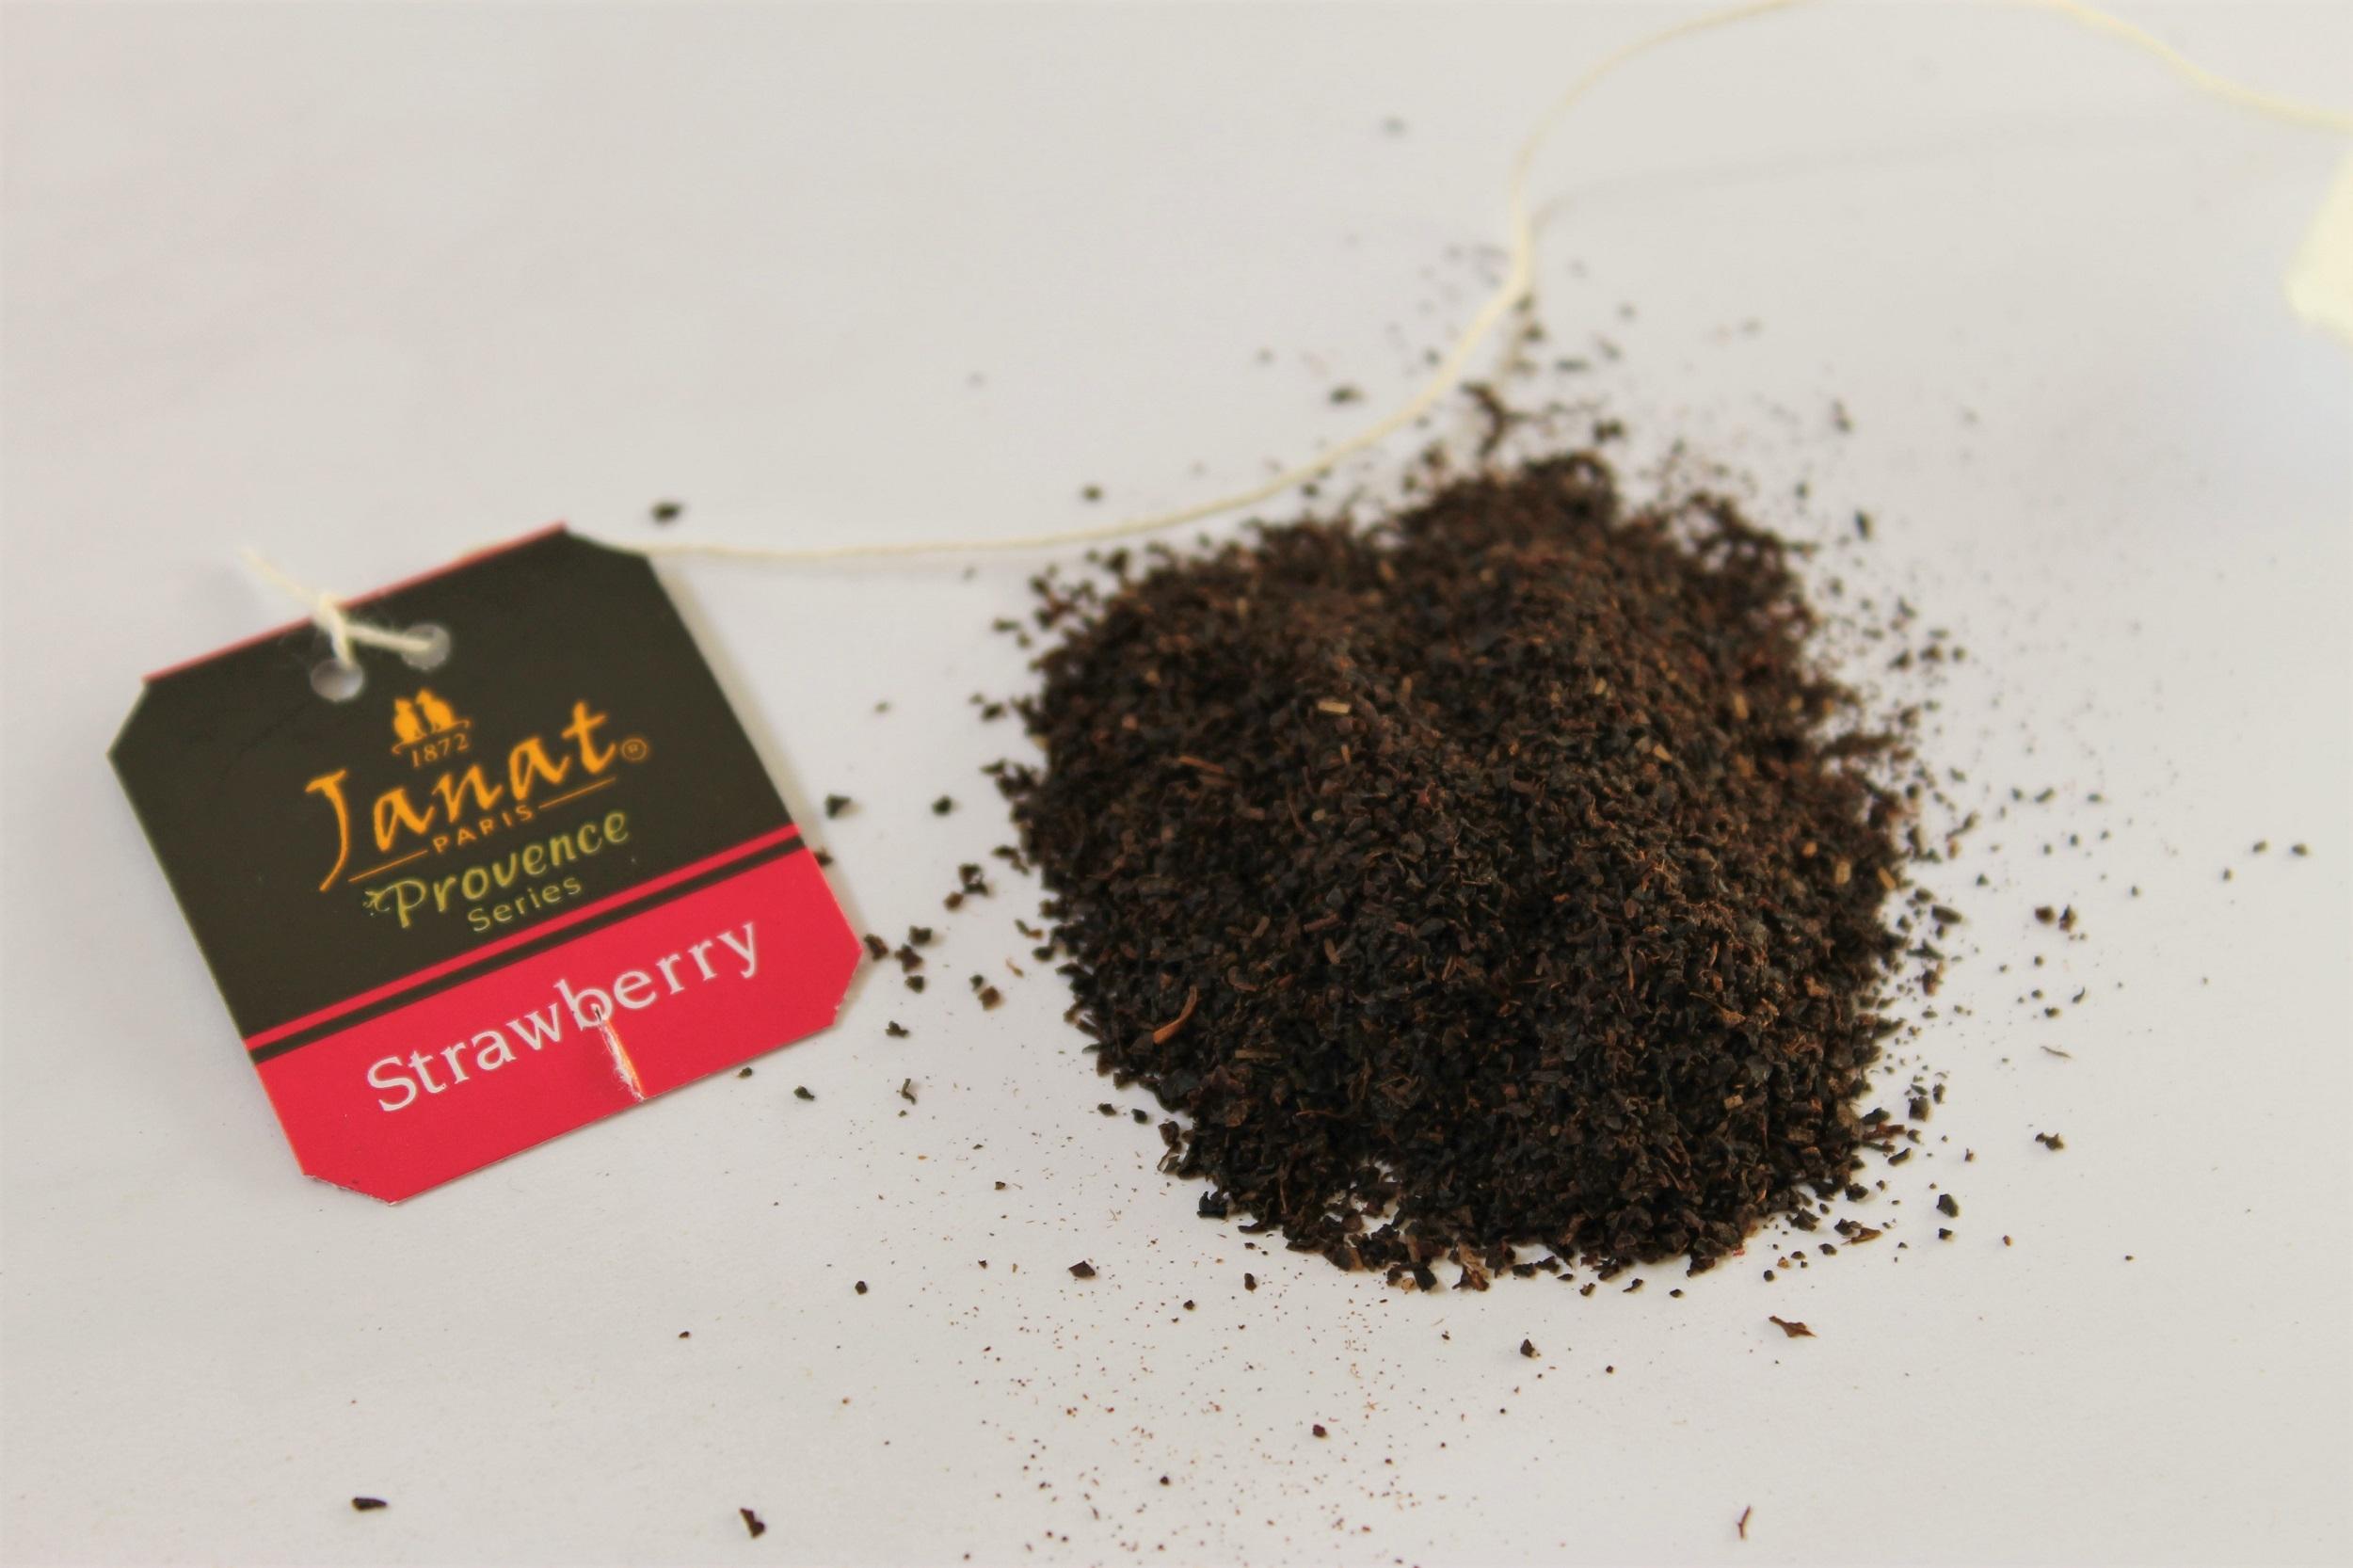 provence series janat strawberry tea